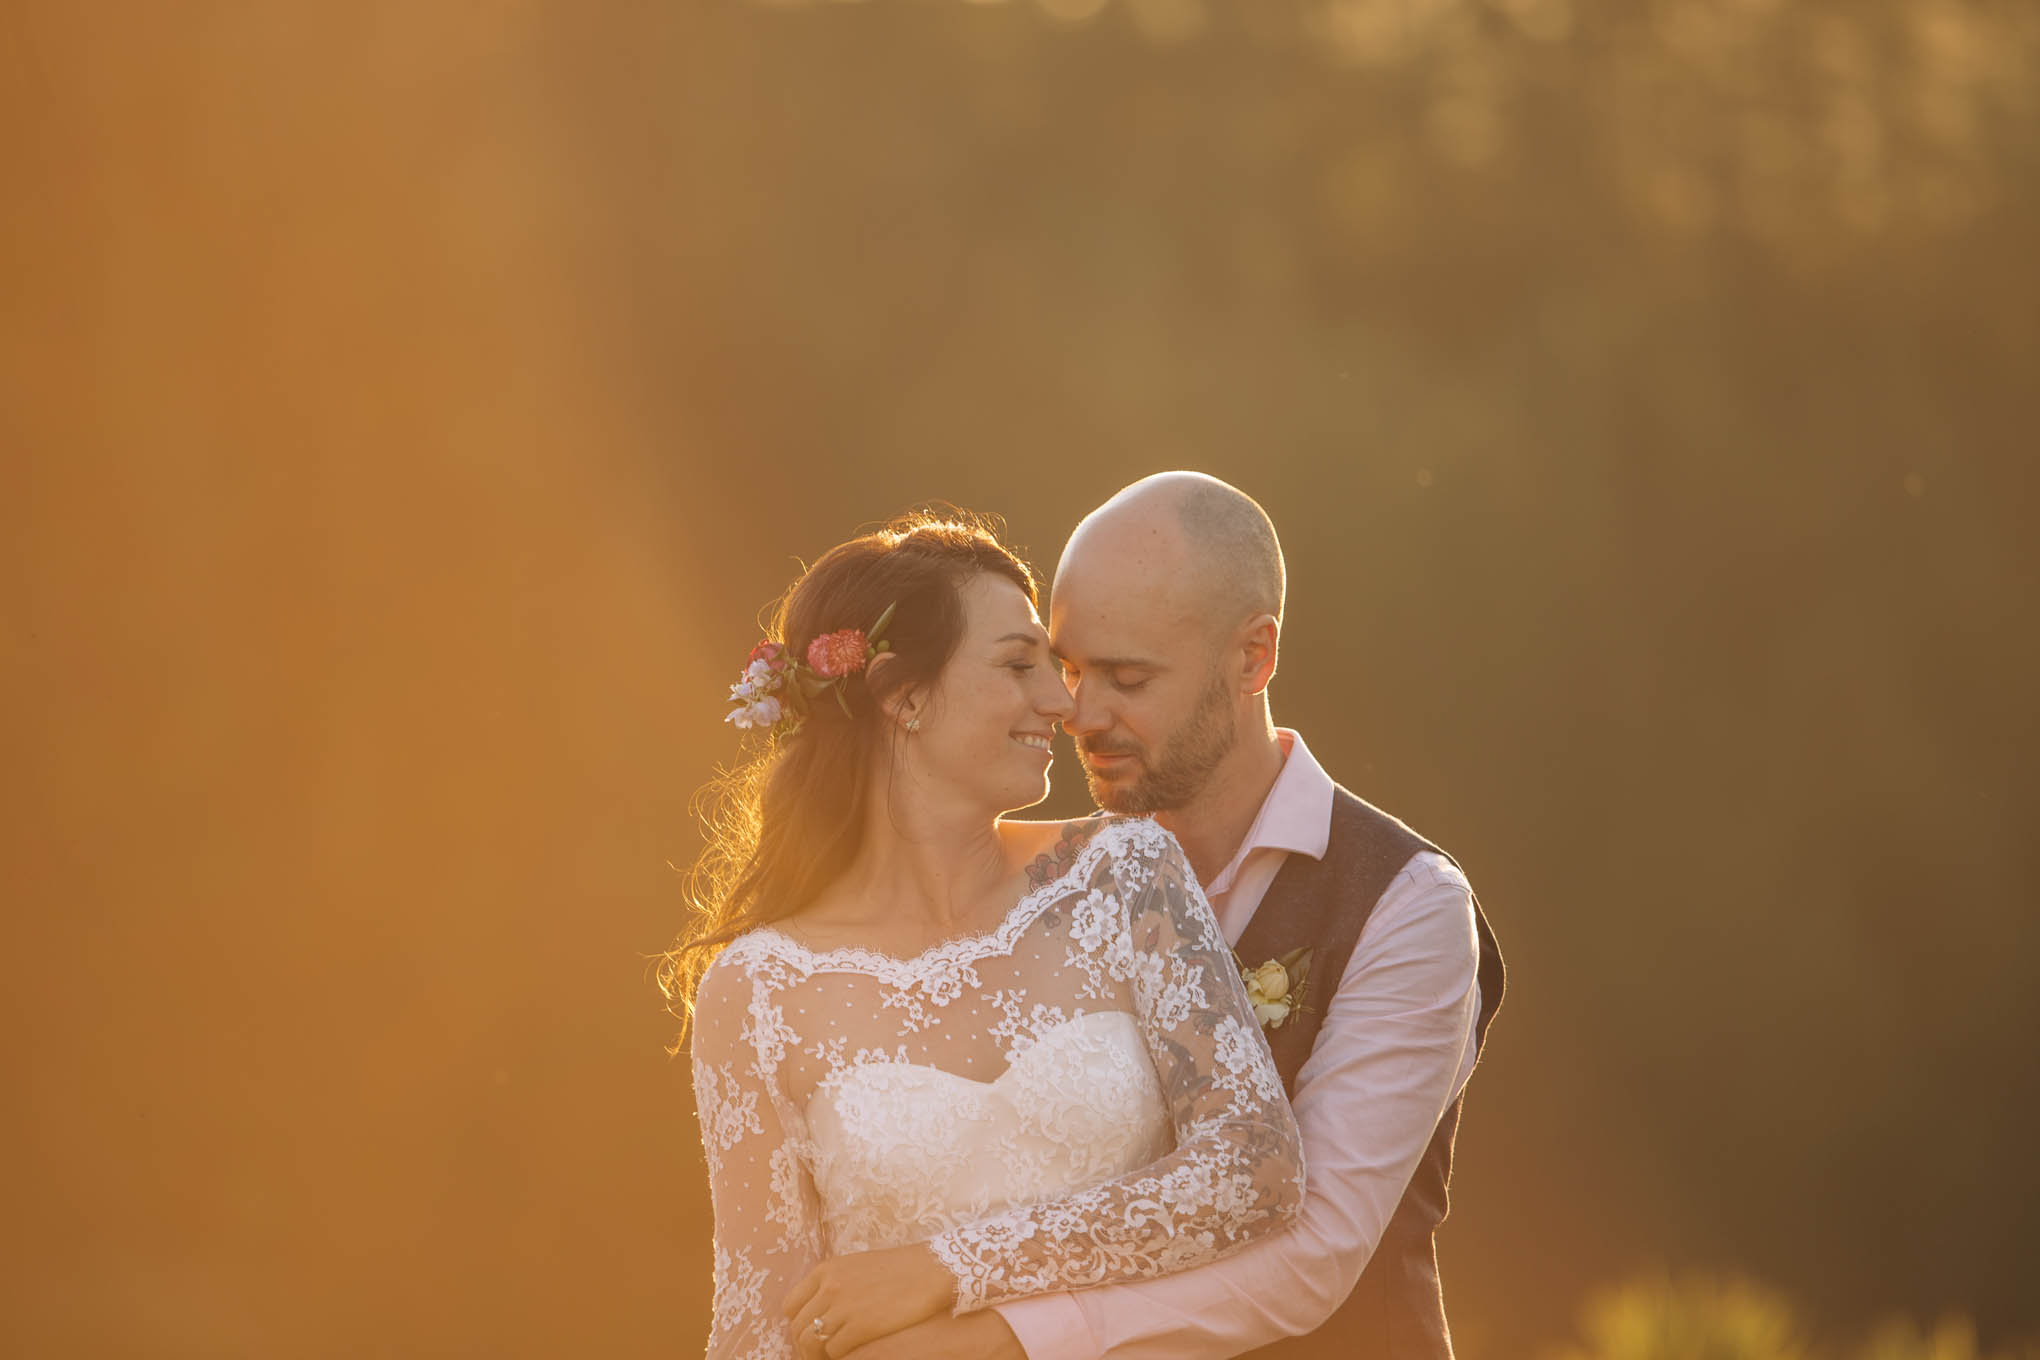 newfound-wedding-photographer-auckland-laura-ed-434